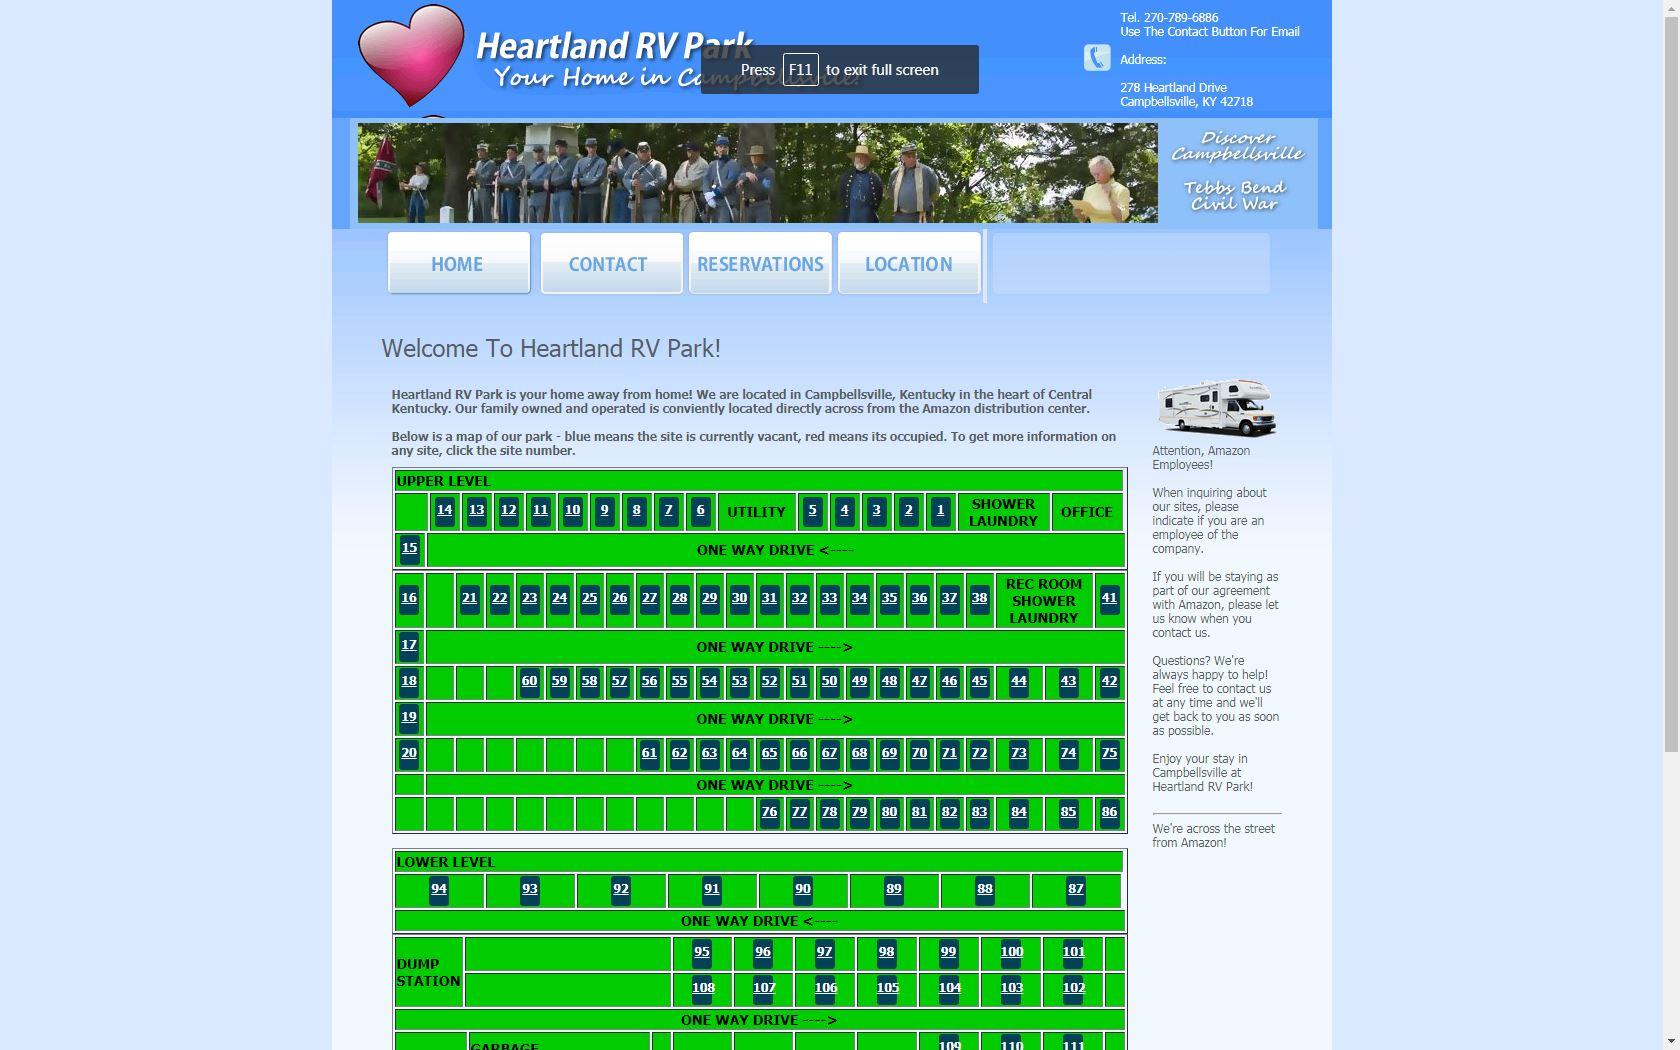 heartland RV park